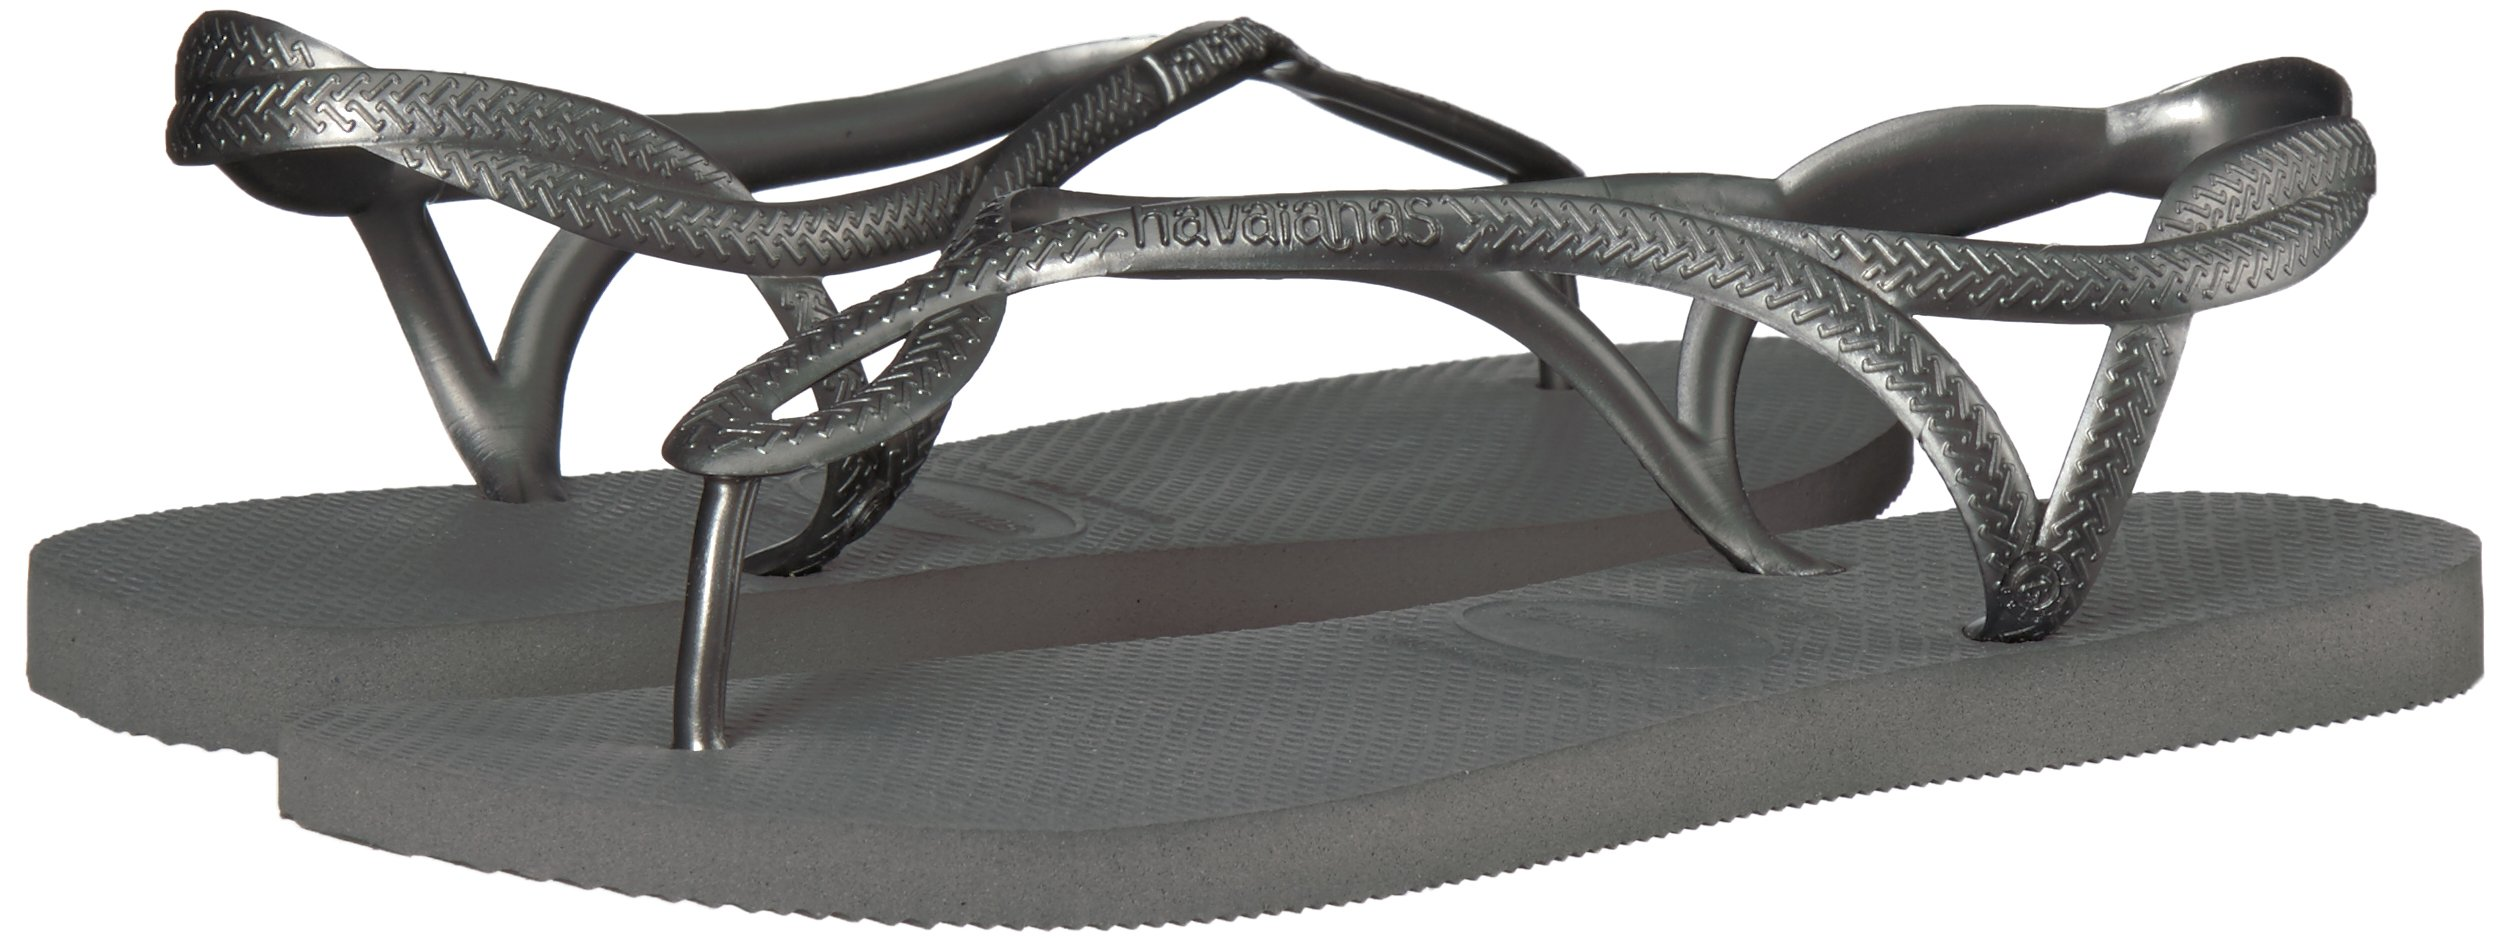 Havaianas Kids' Luna Flip Flop Around Ankle Straps, Roman Sandal, Steel Grey by Havaianas (Image #6)